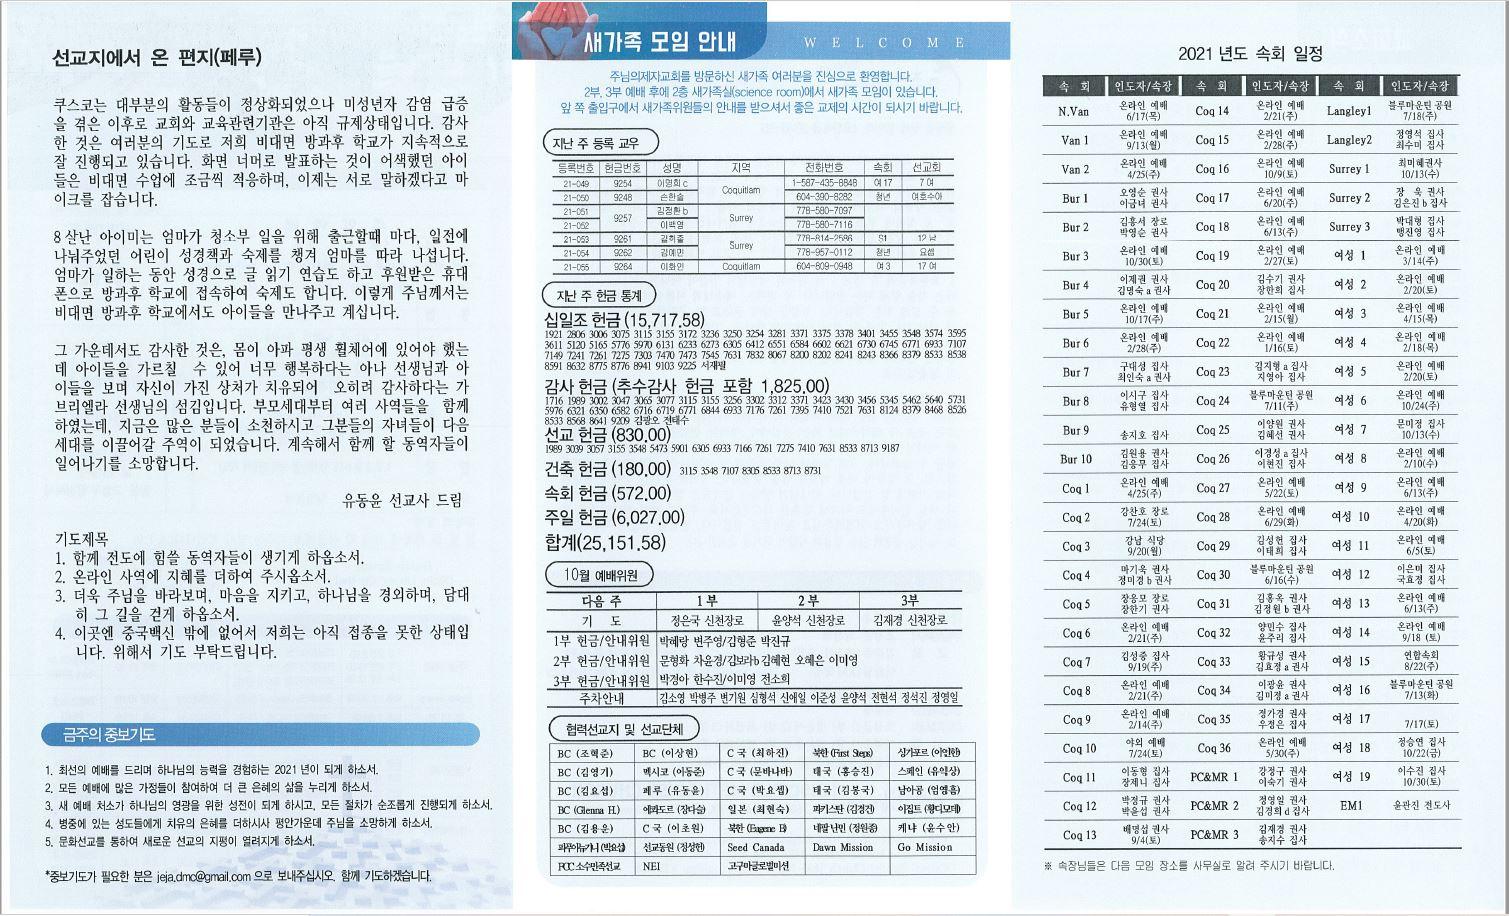 mb-file.php?path=2021%2F10%2F01%2FF2858_Capture-1.JPG